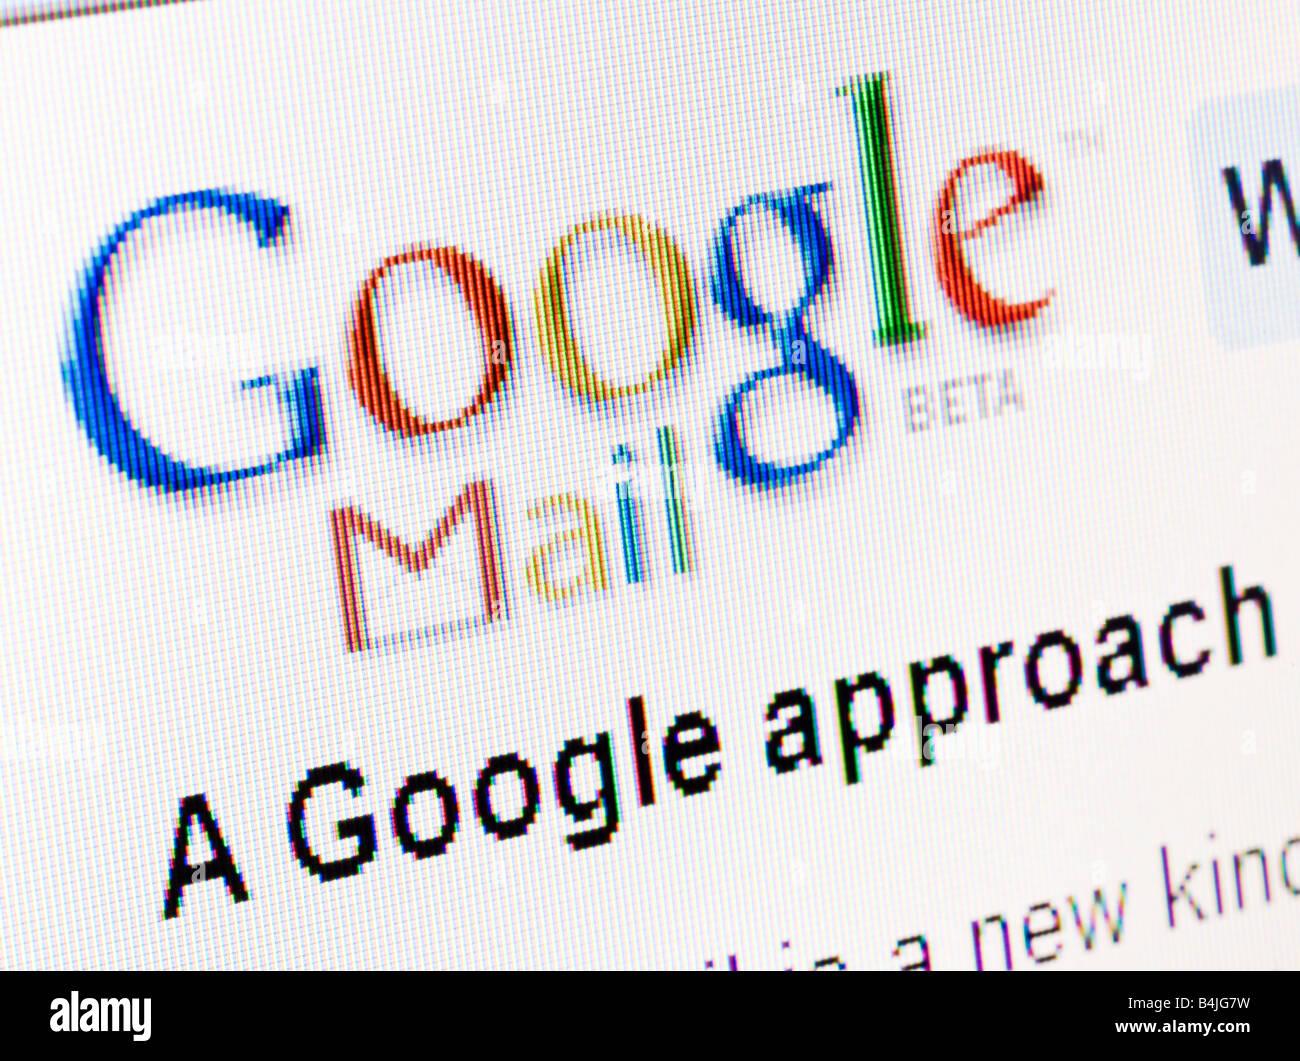 Google Mail GMAIL website splash screen and logo - Stock Image